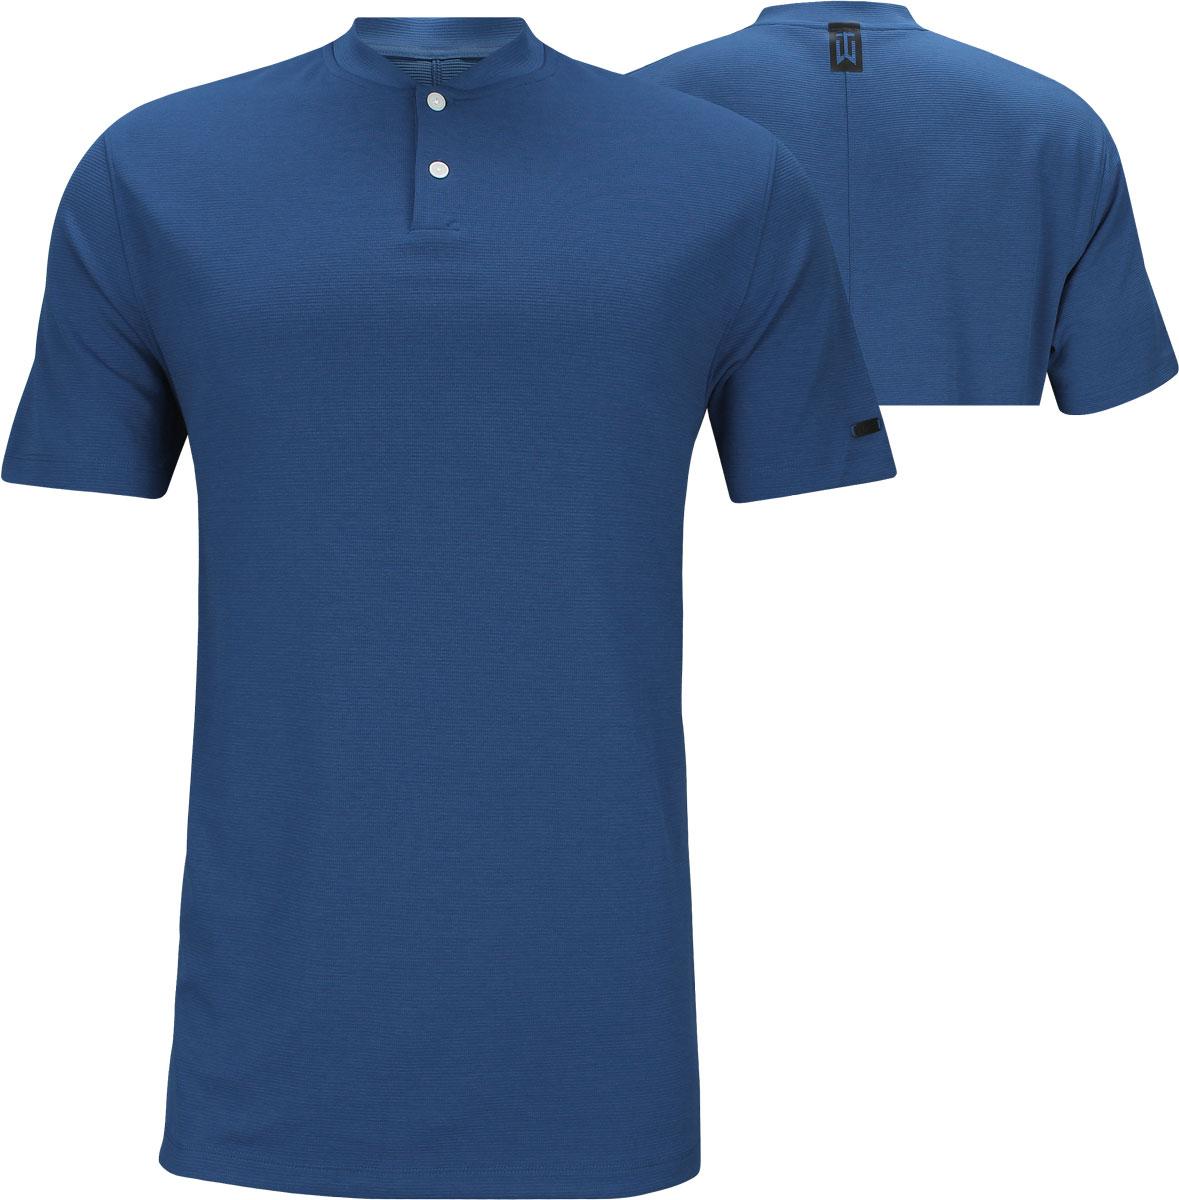 8884dd91e Nike Dri Fit Aeroreact Short Sleeve T Shirt Womens